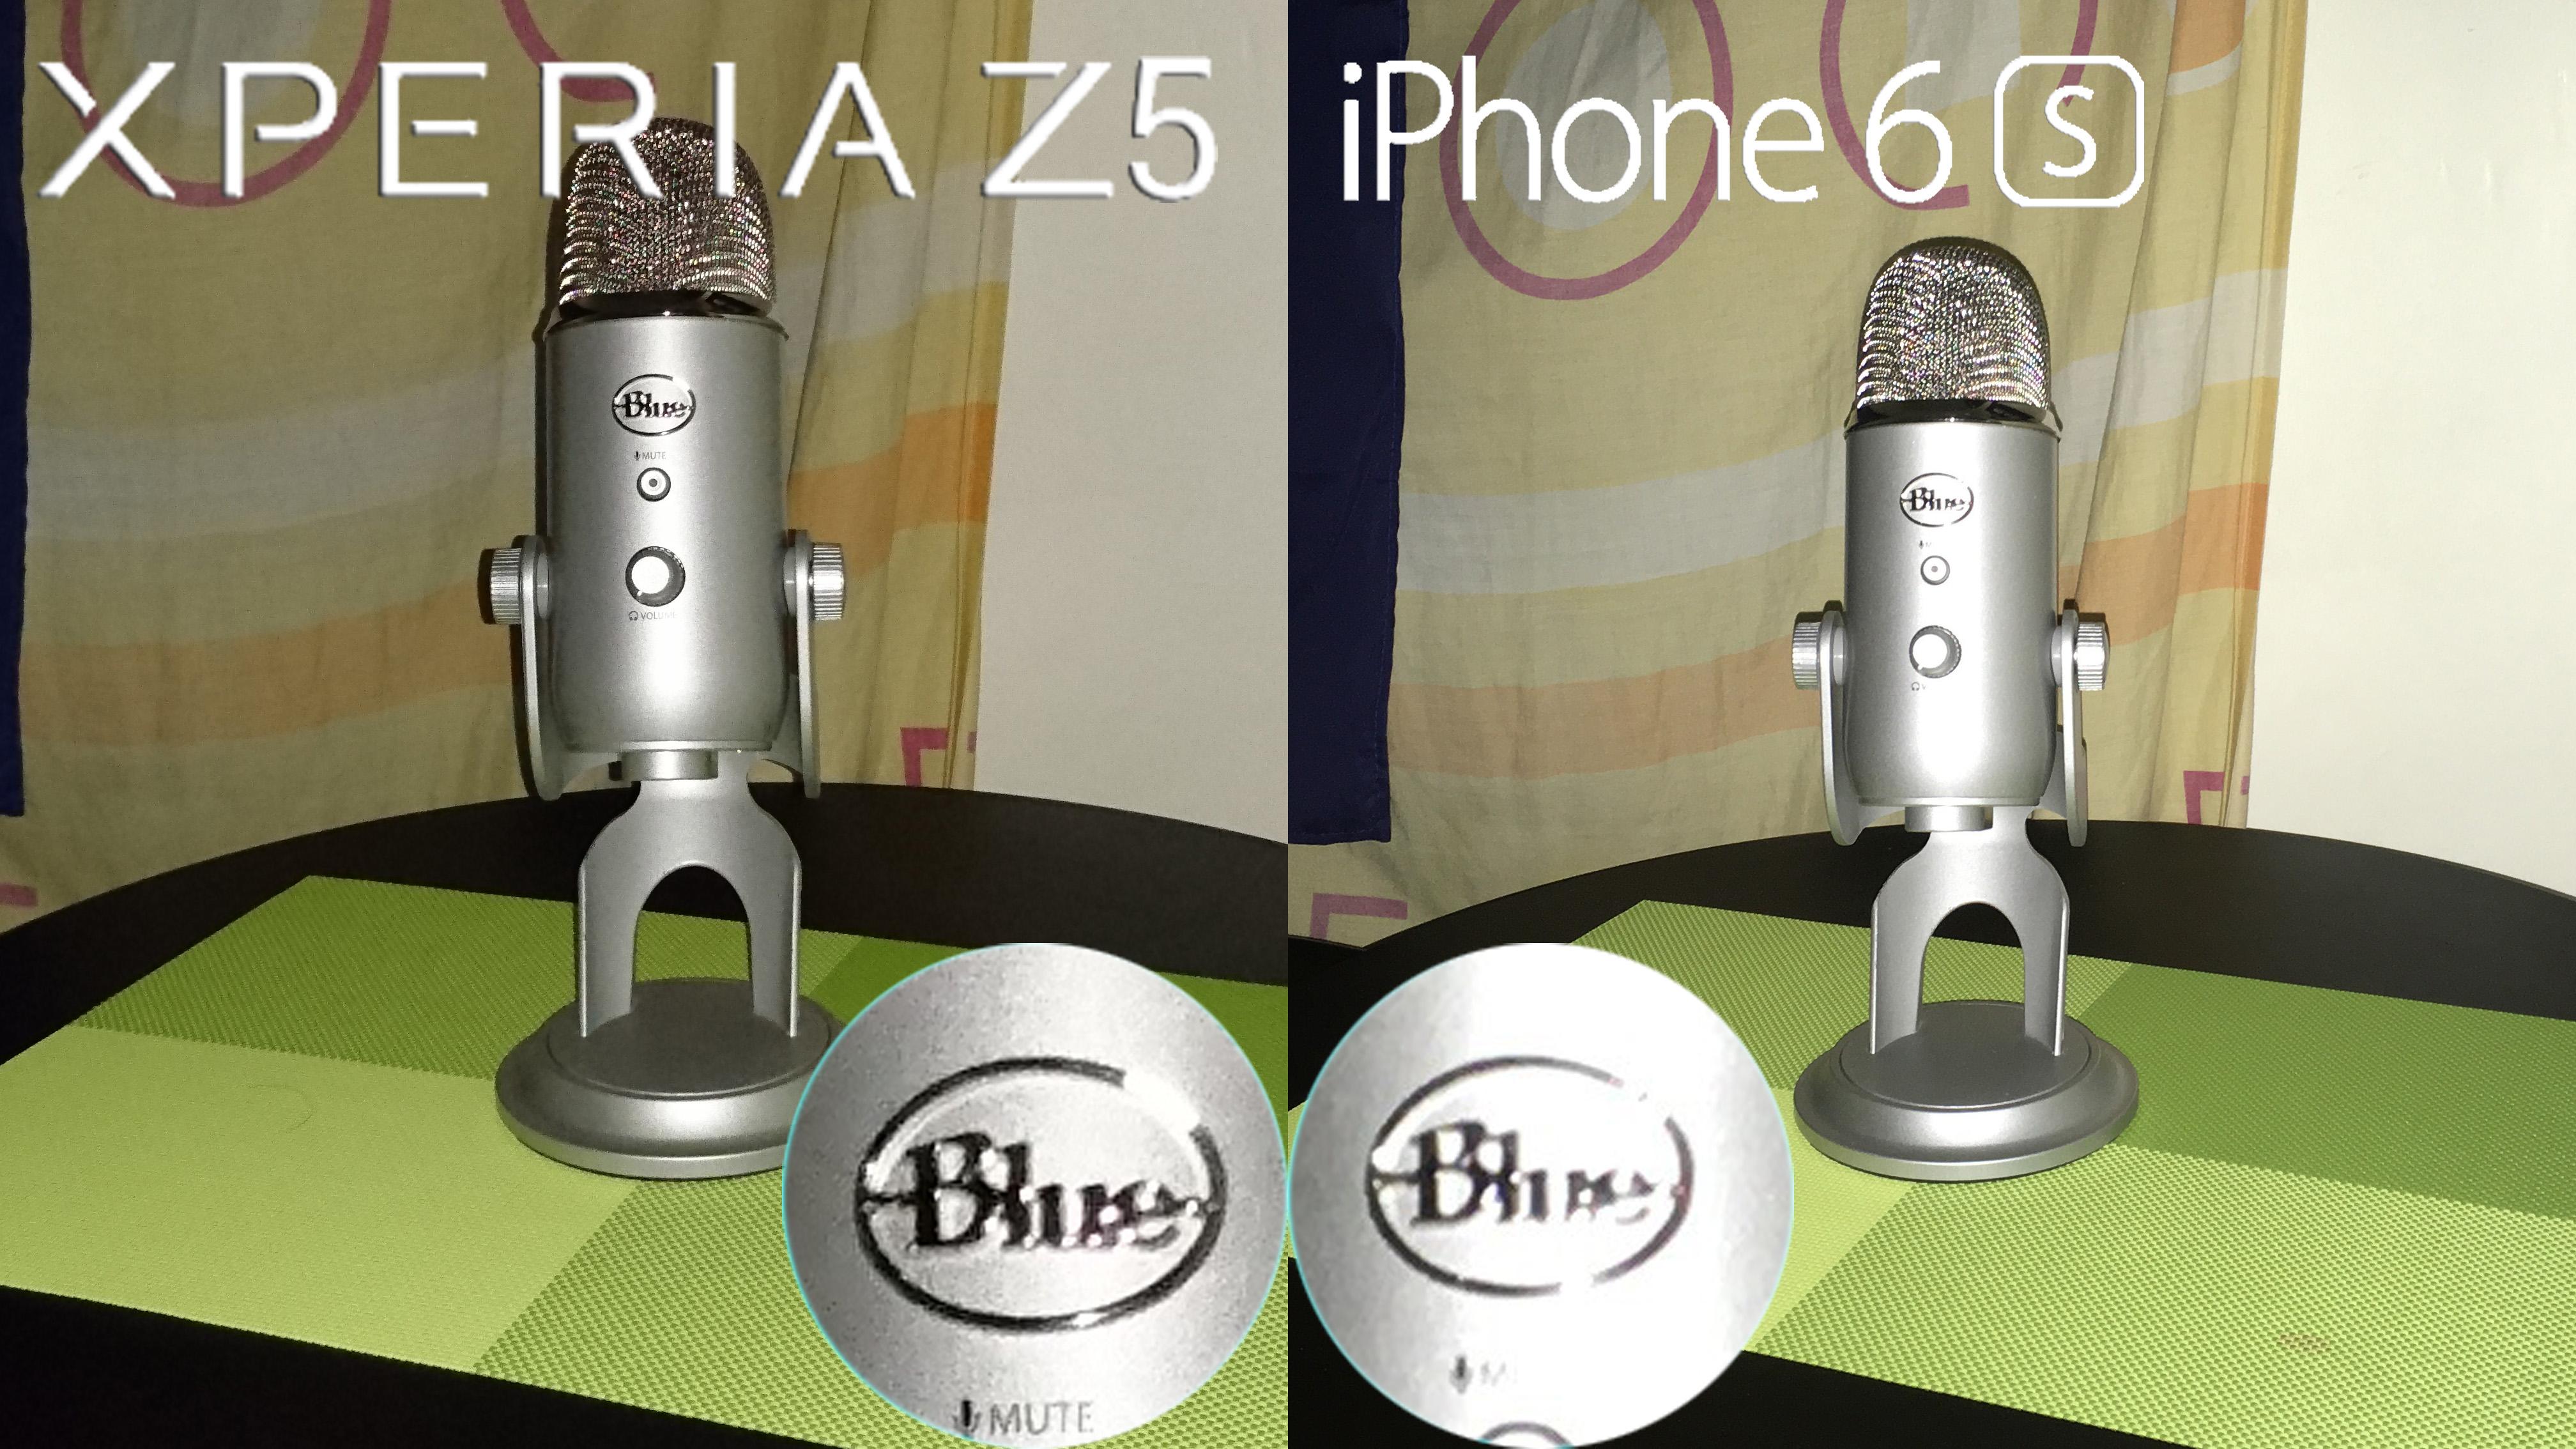 Xperia z3 vs iphone 6s